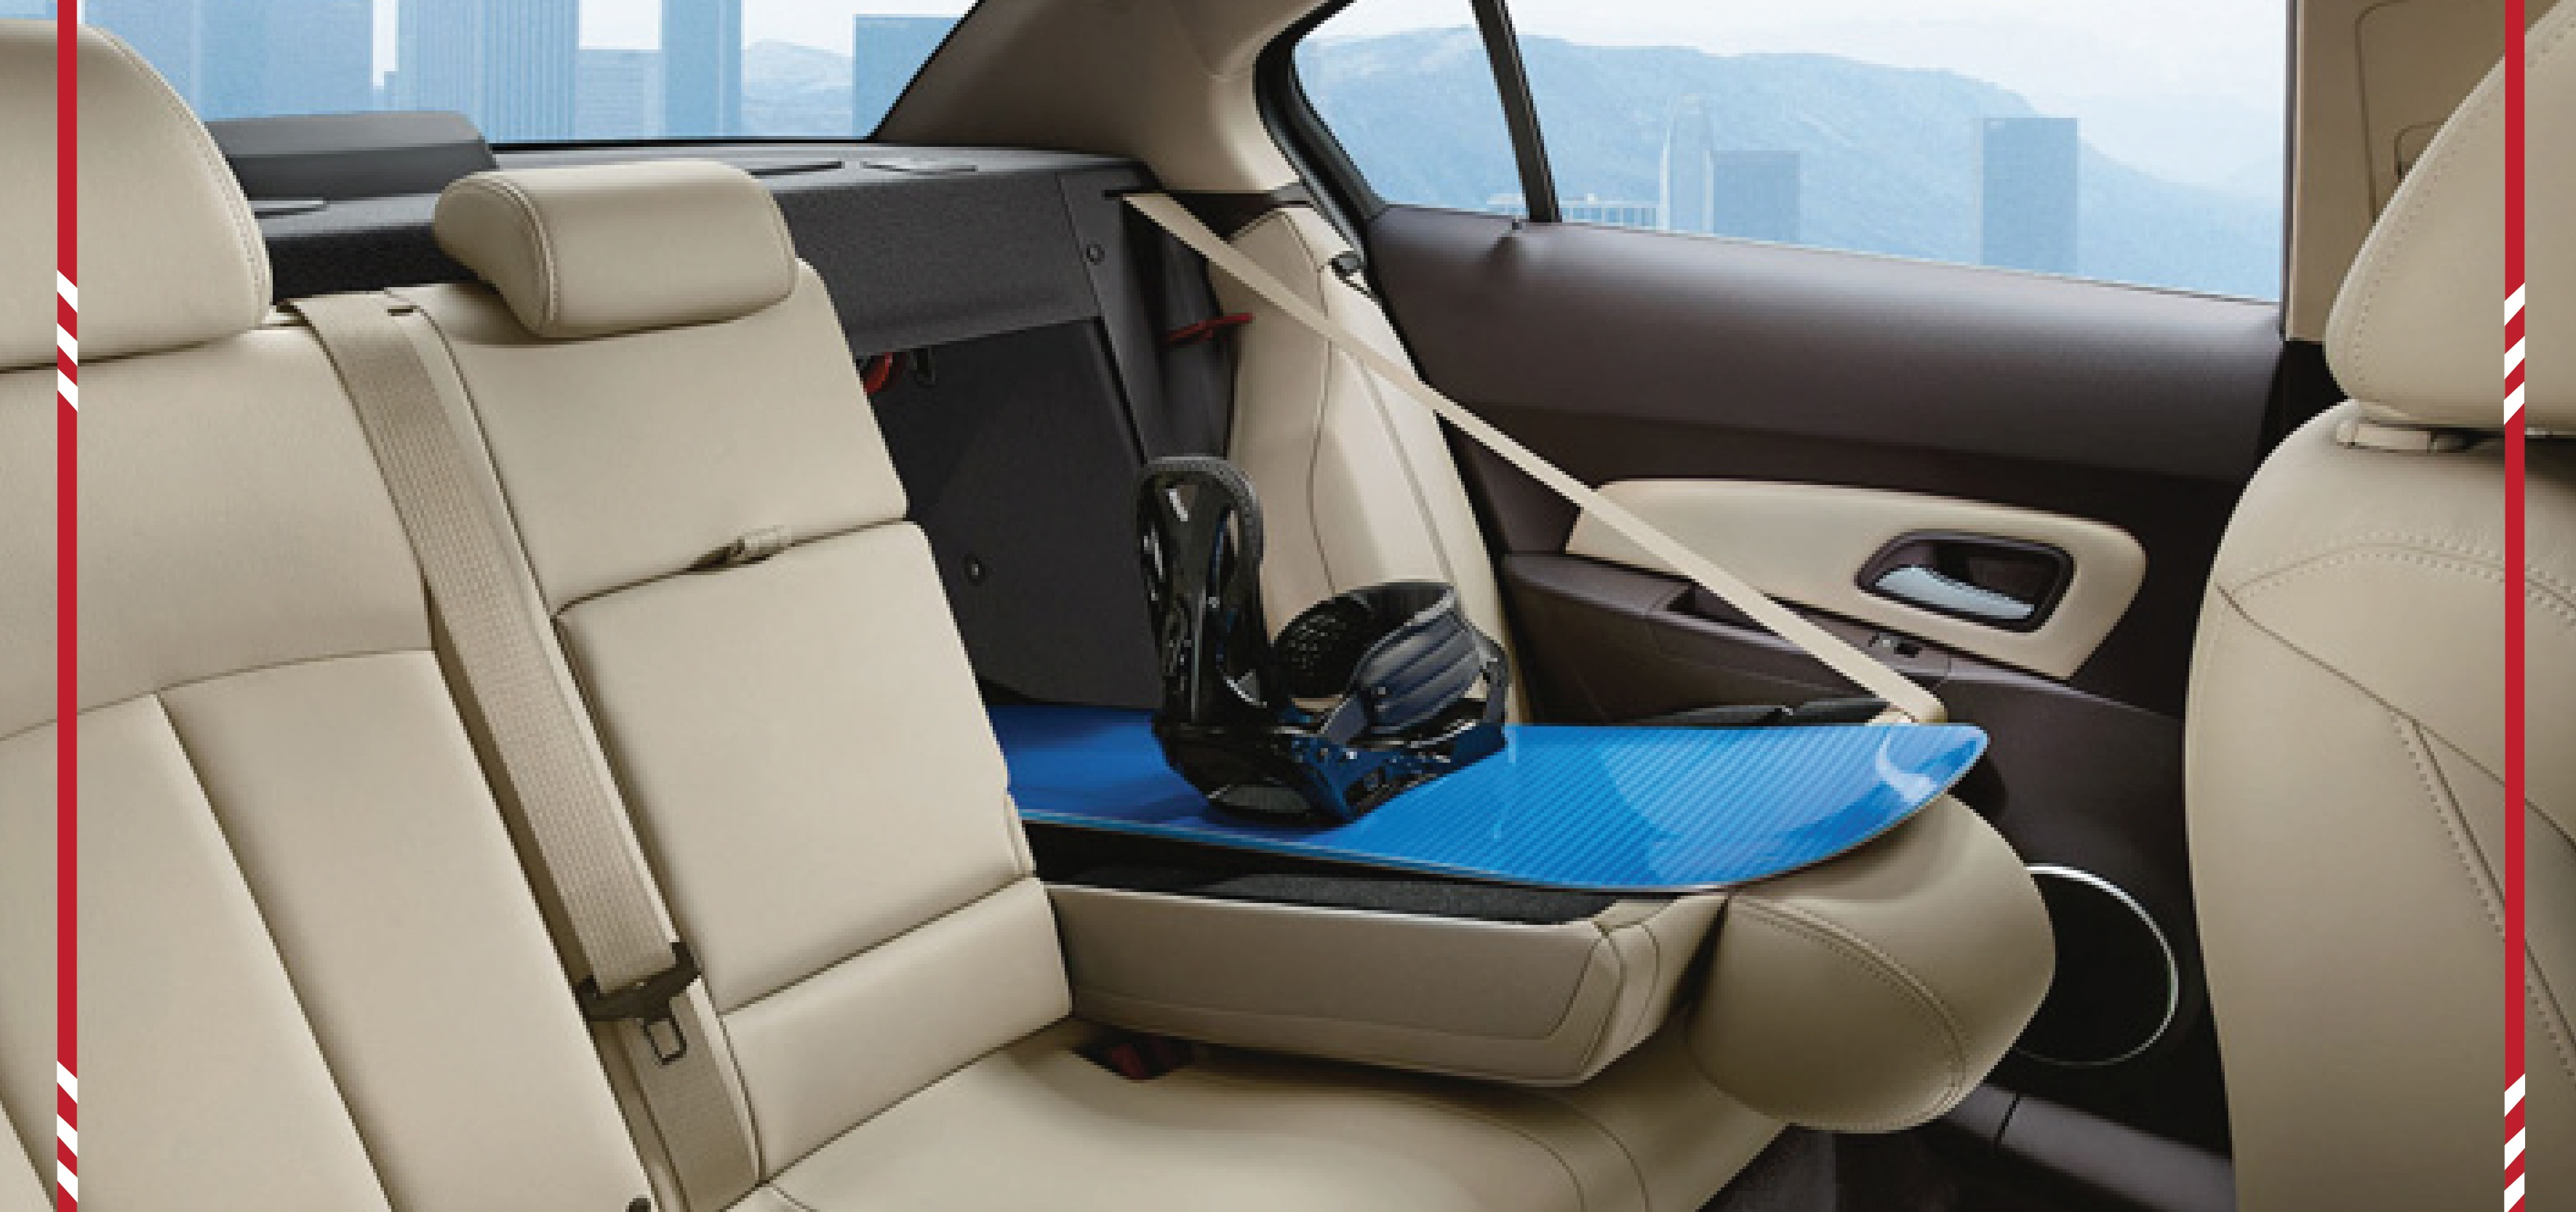 Chevrolet Cruze Interior 8